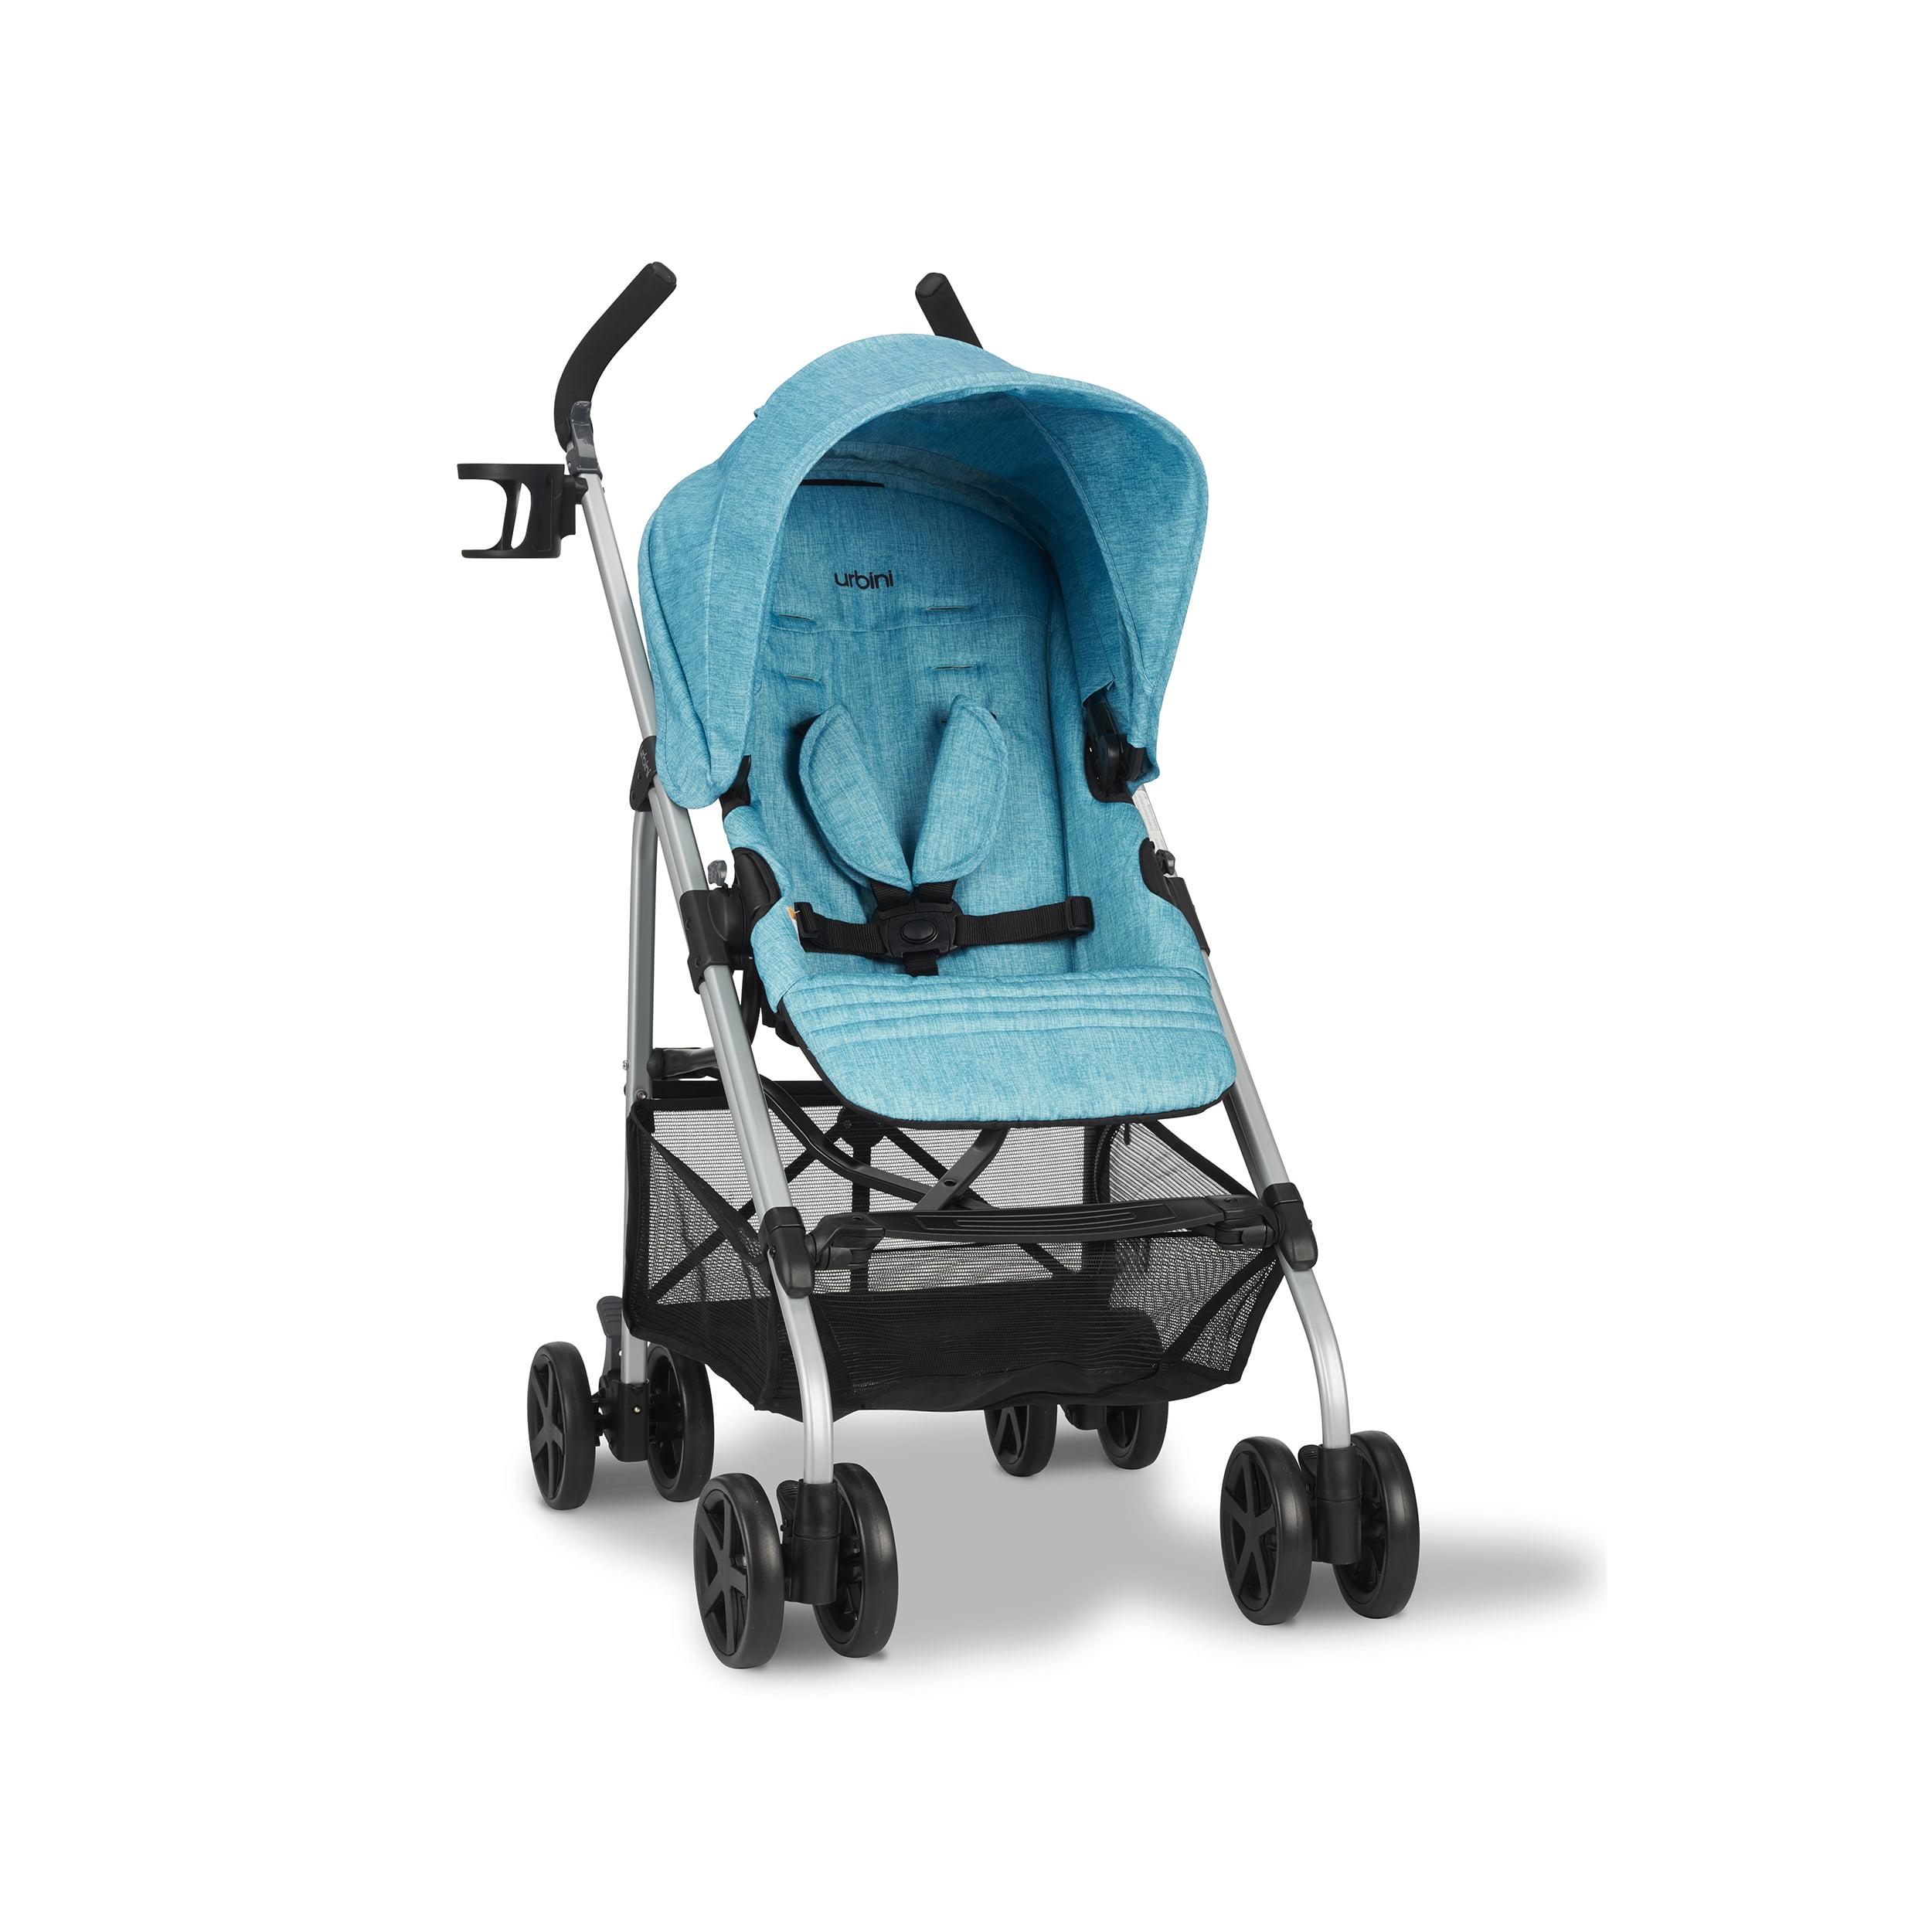 Urbini Reversi Stroller Special Edition, Blueberry Fizz